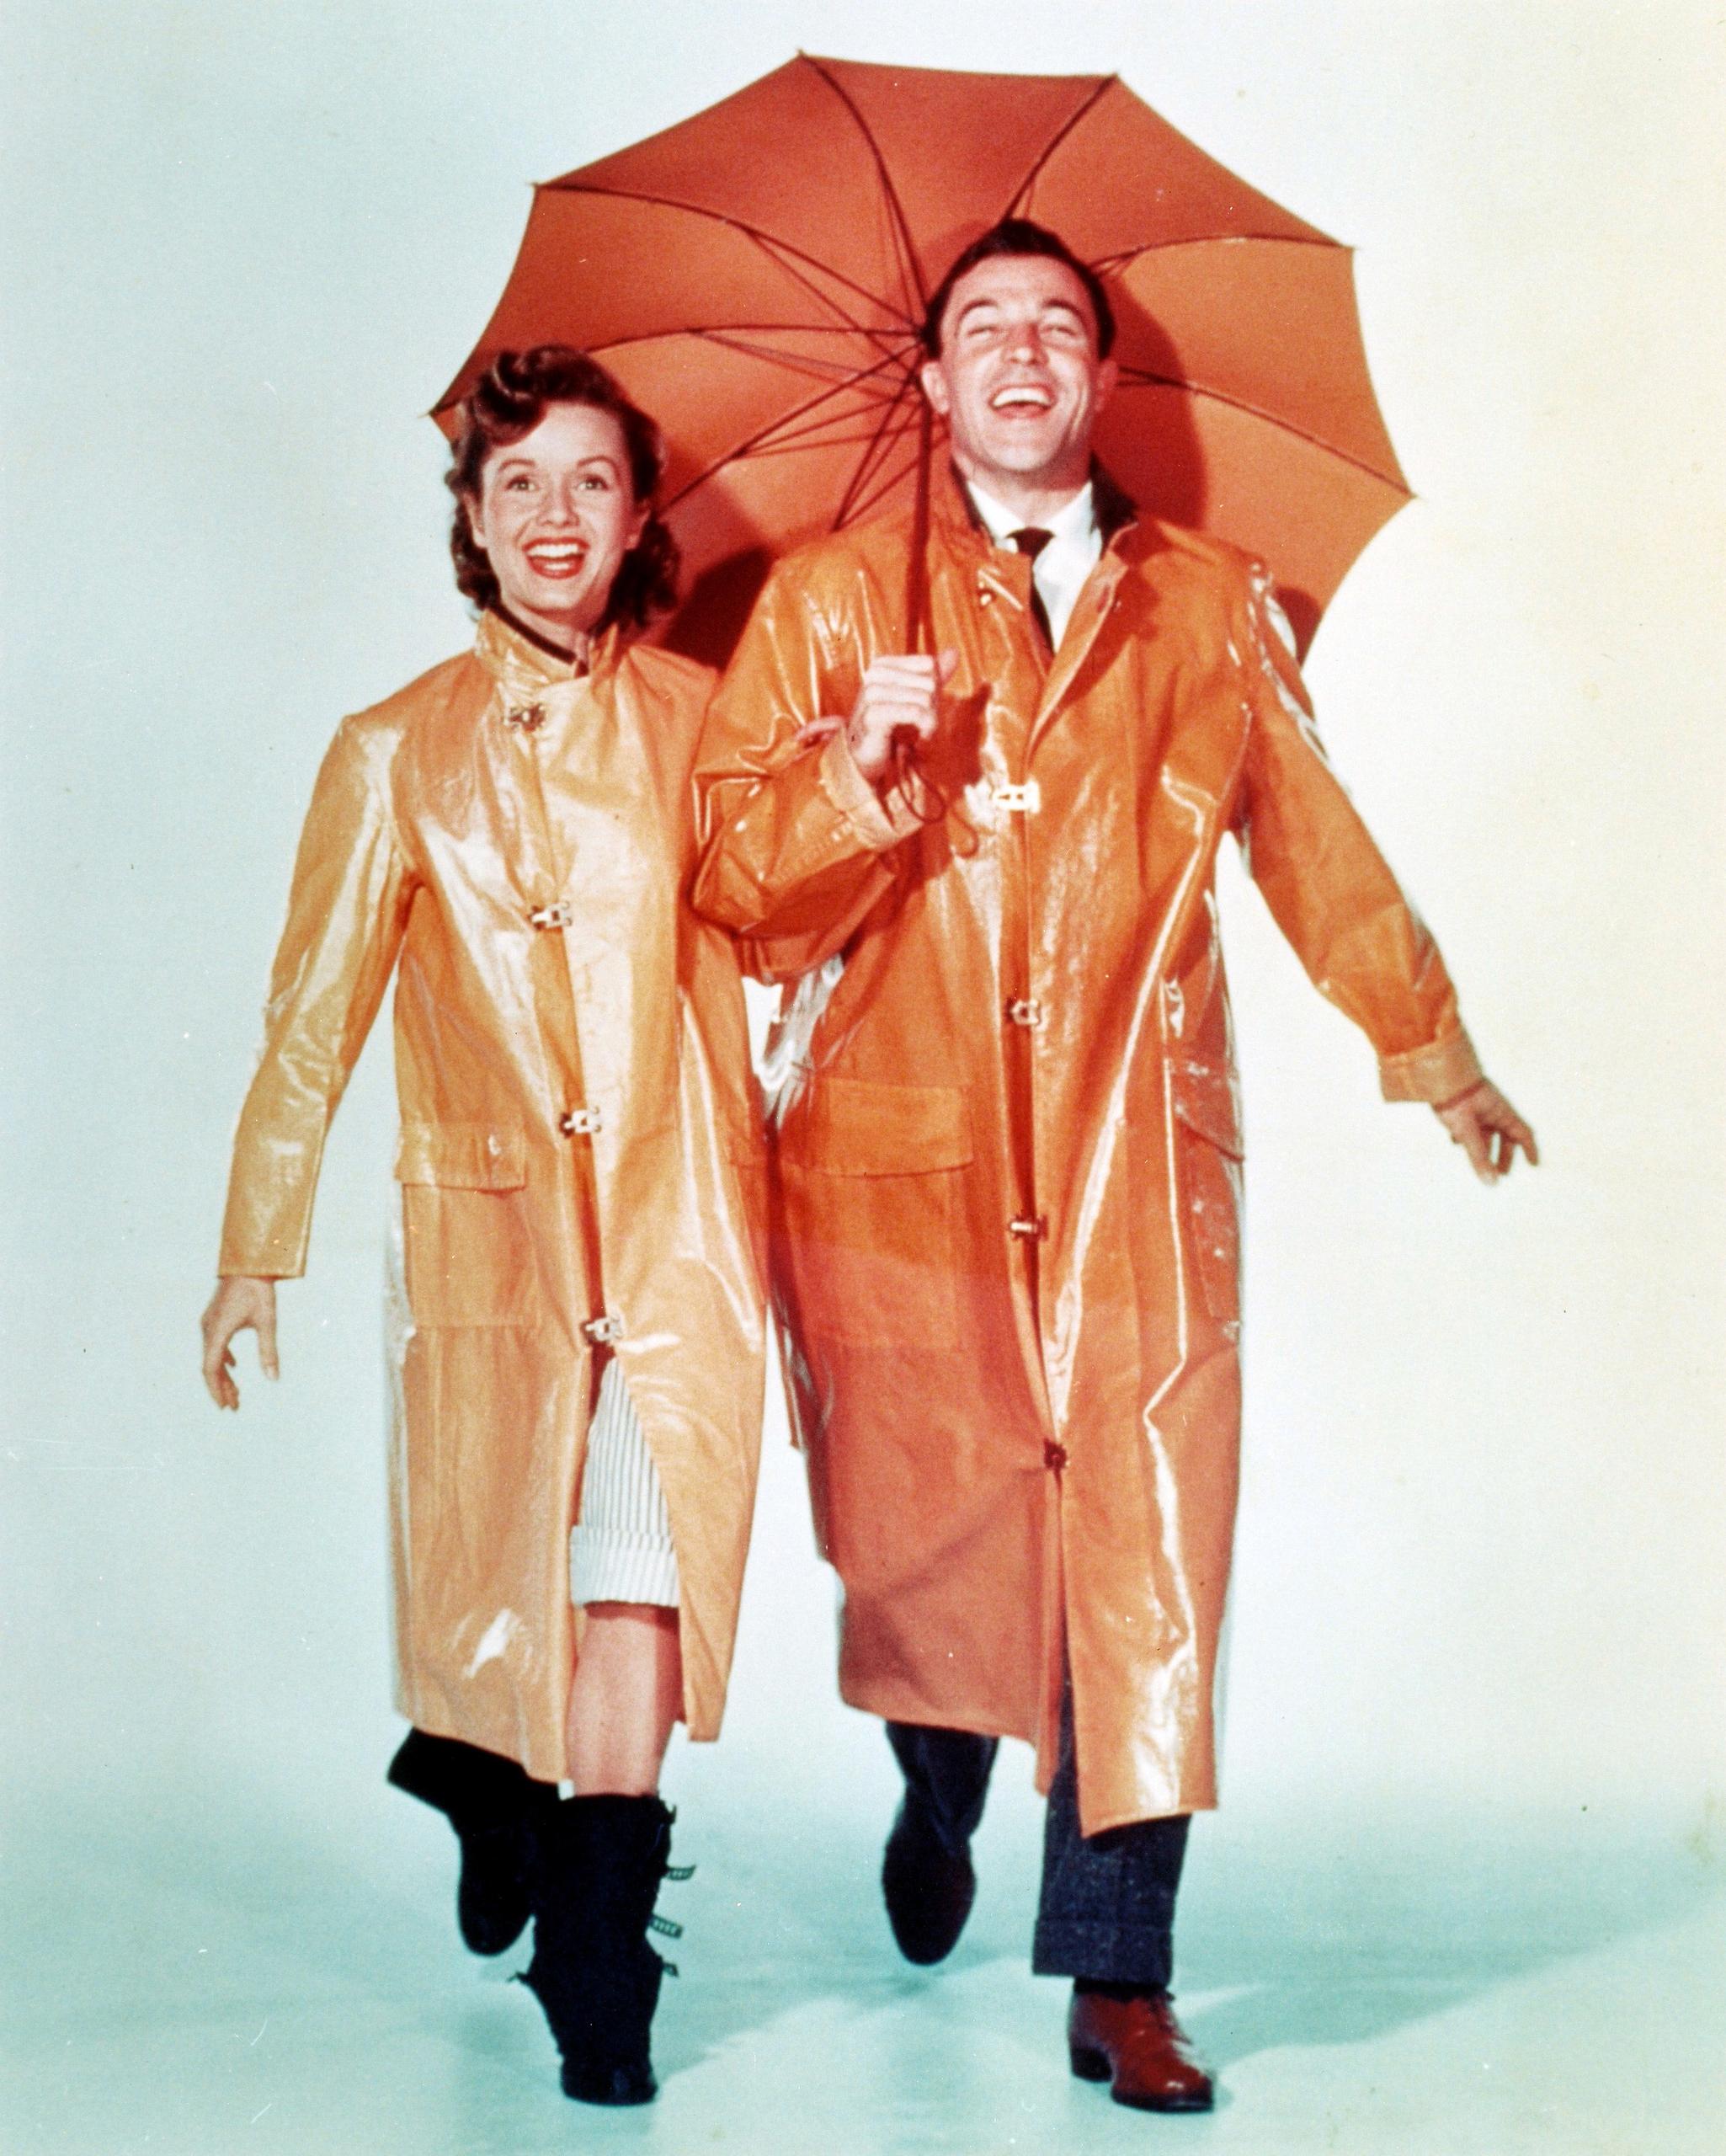 Debbie Reynolds as Kathy Seldon in 'Singin' in the Rain' with actor Gene Kelly as Don Lockwood, 1952